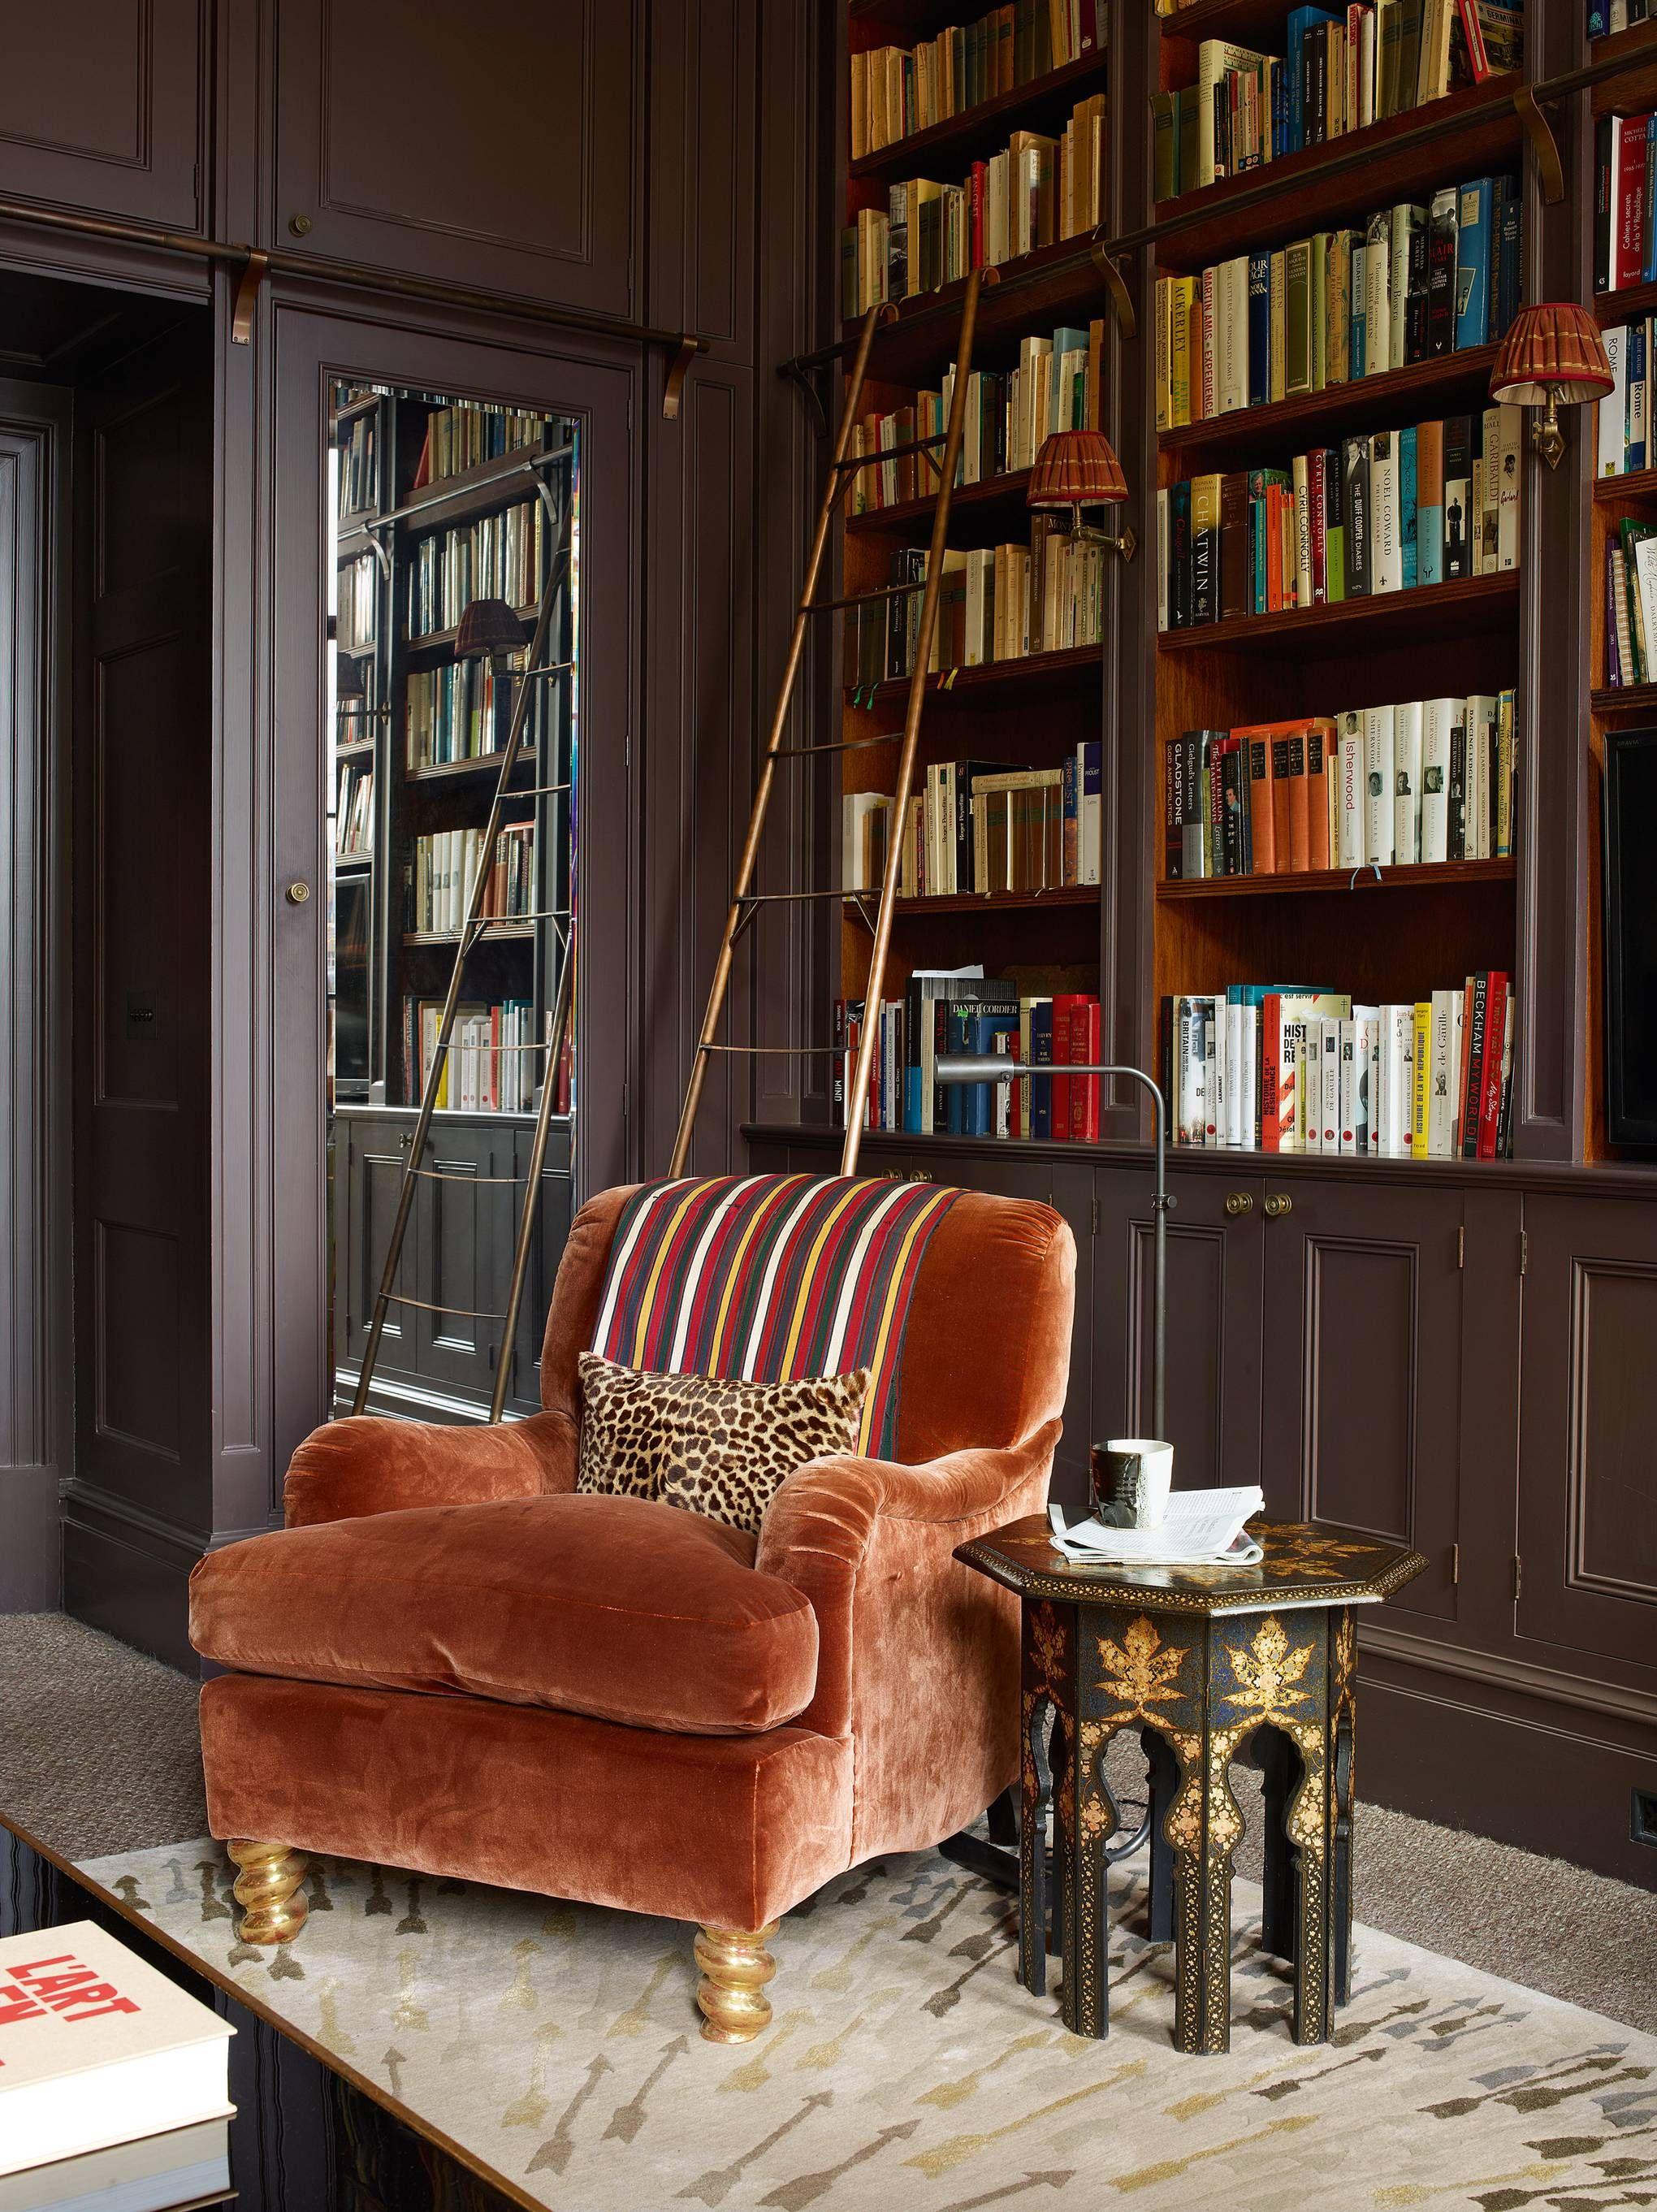 Douglas Mackie's deeply sophisticated Marylebone flat in